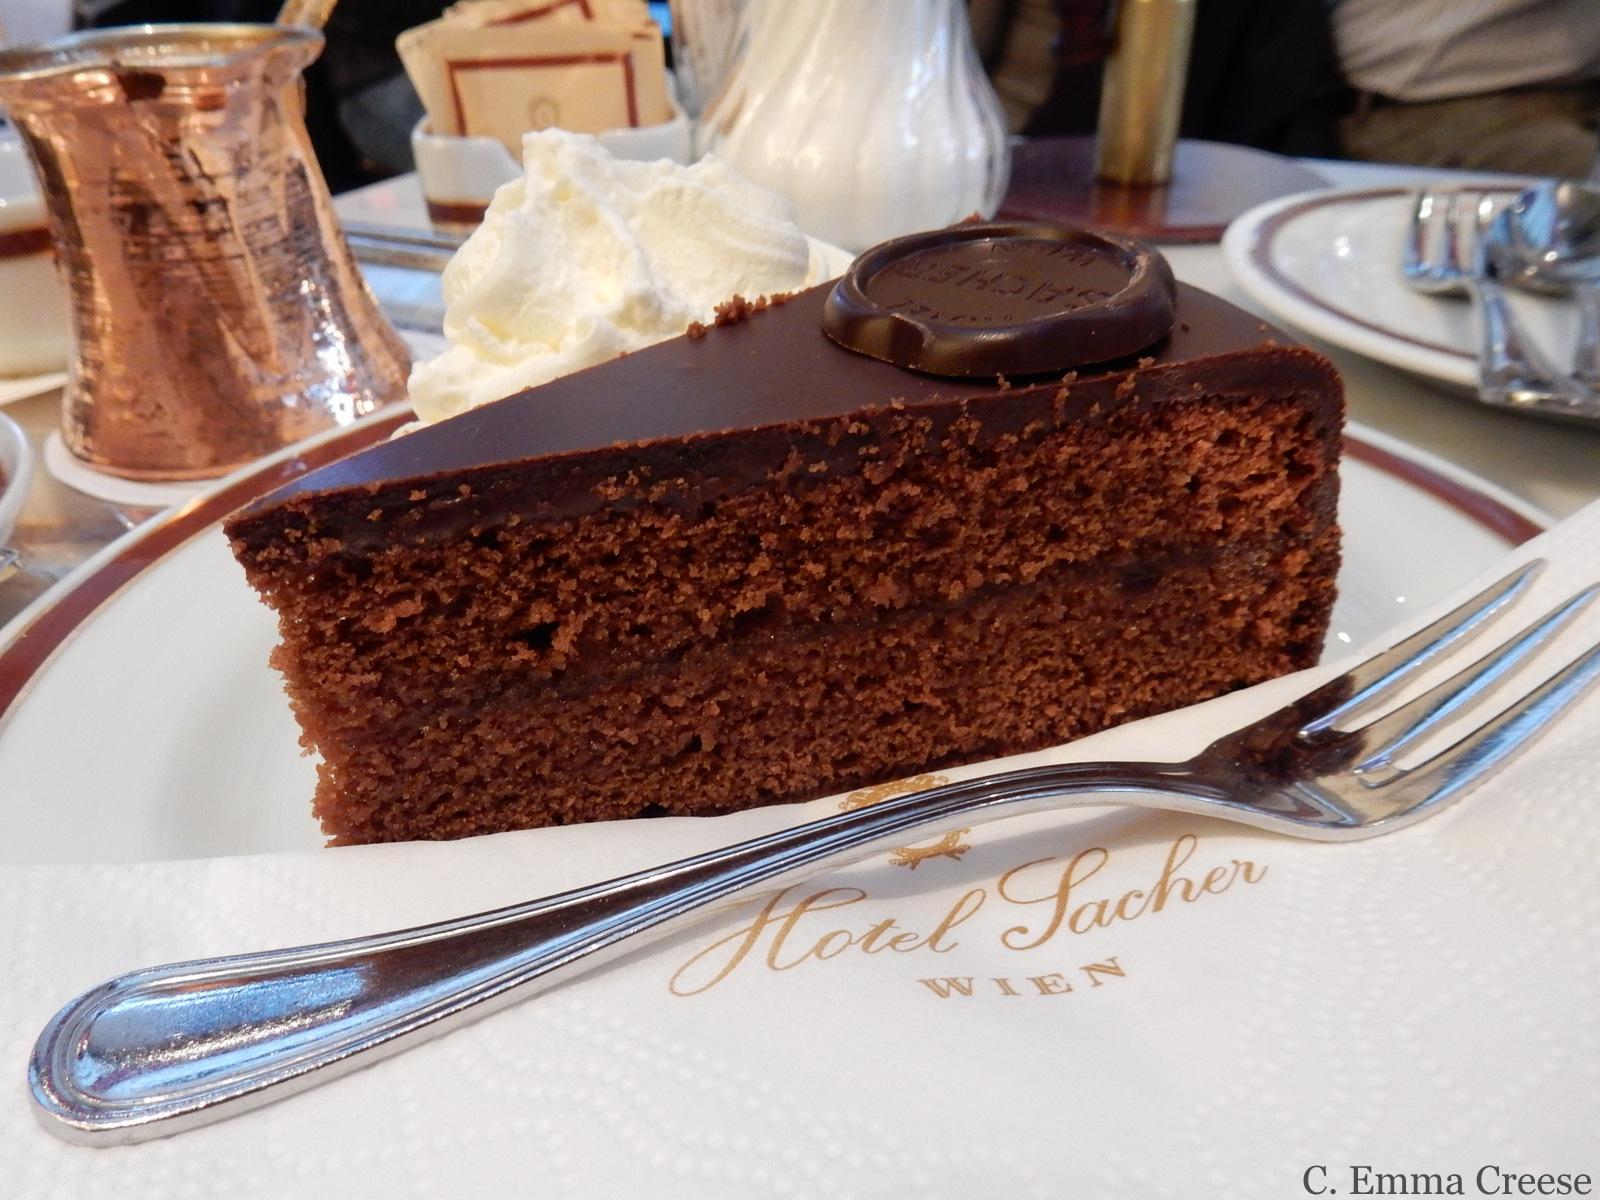 Vienna Sacher Torte Adventures of a London Kiwi